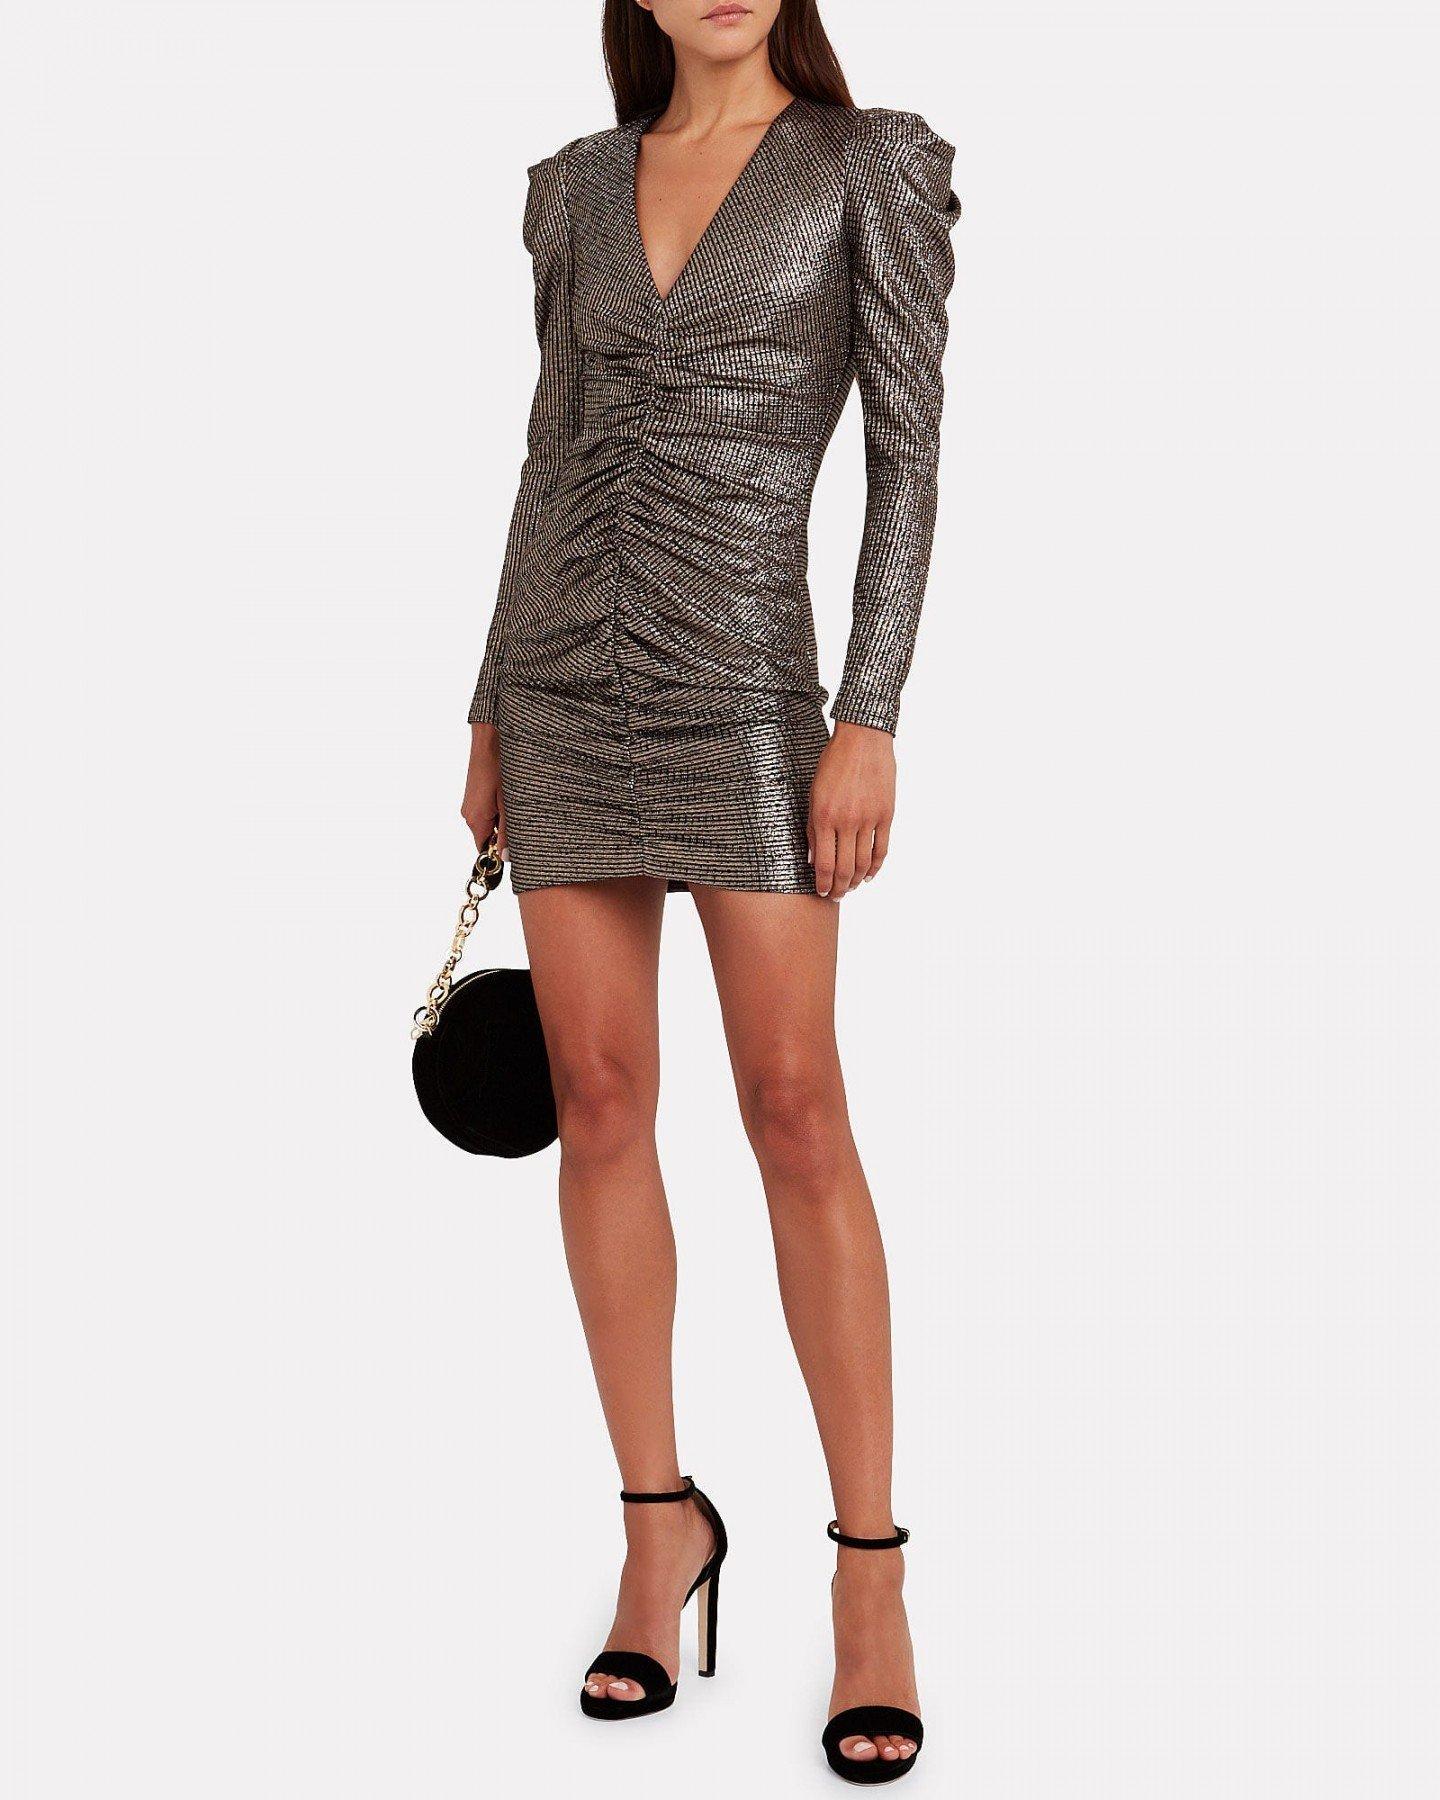 JONATHAN SIMKHAI Lamé Puff Sleeve Mini Dress